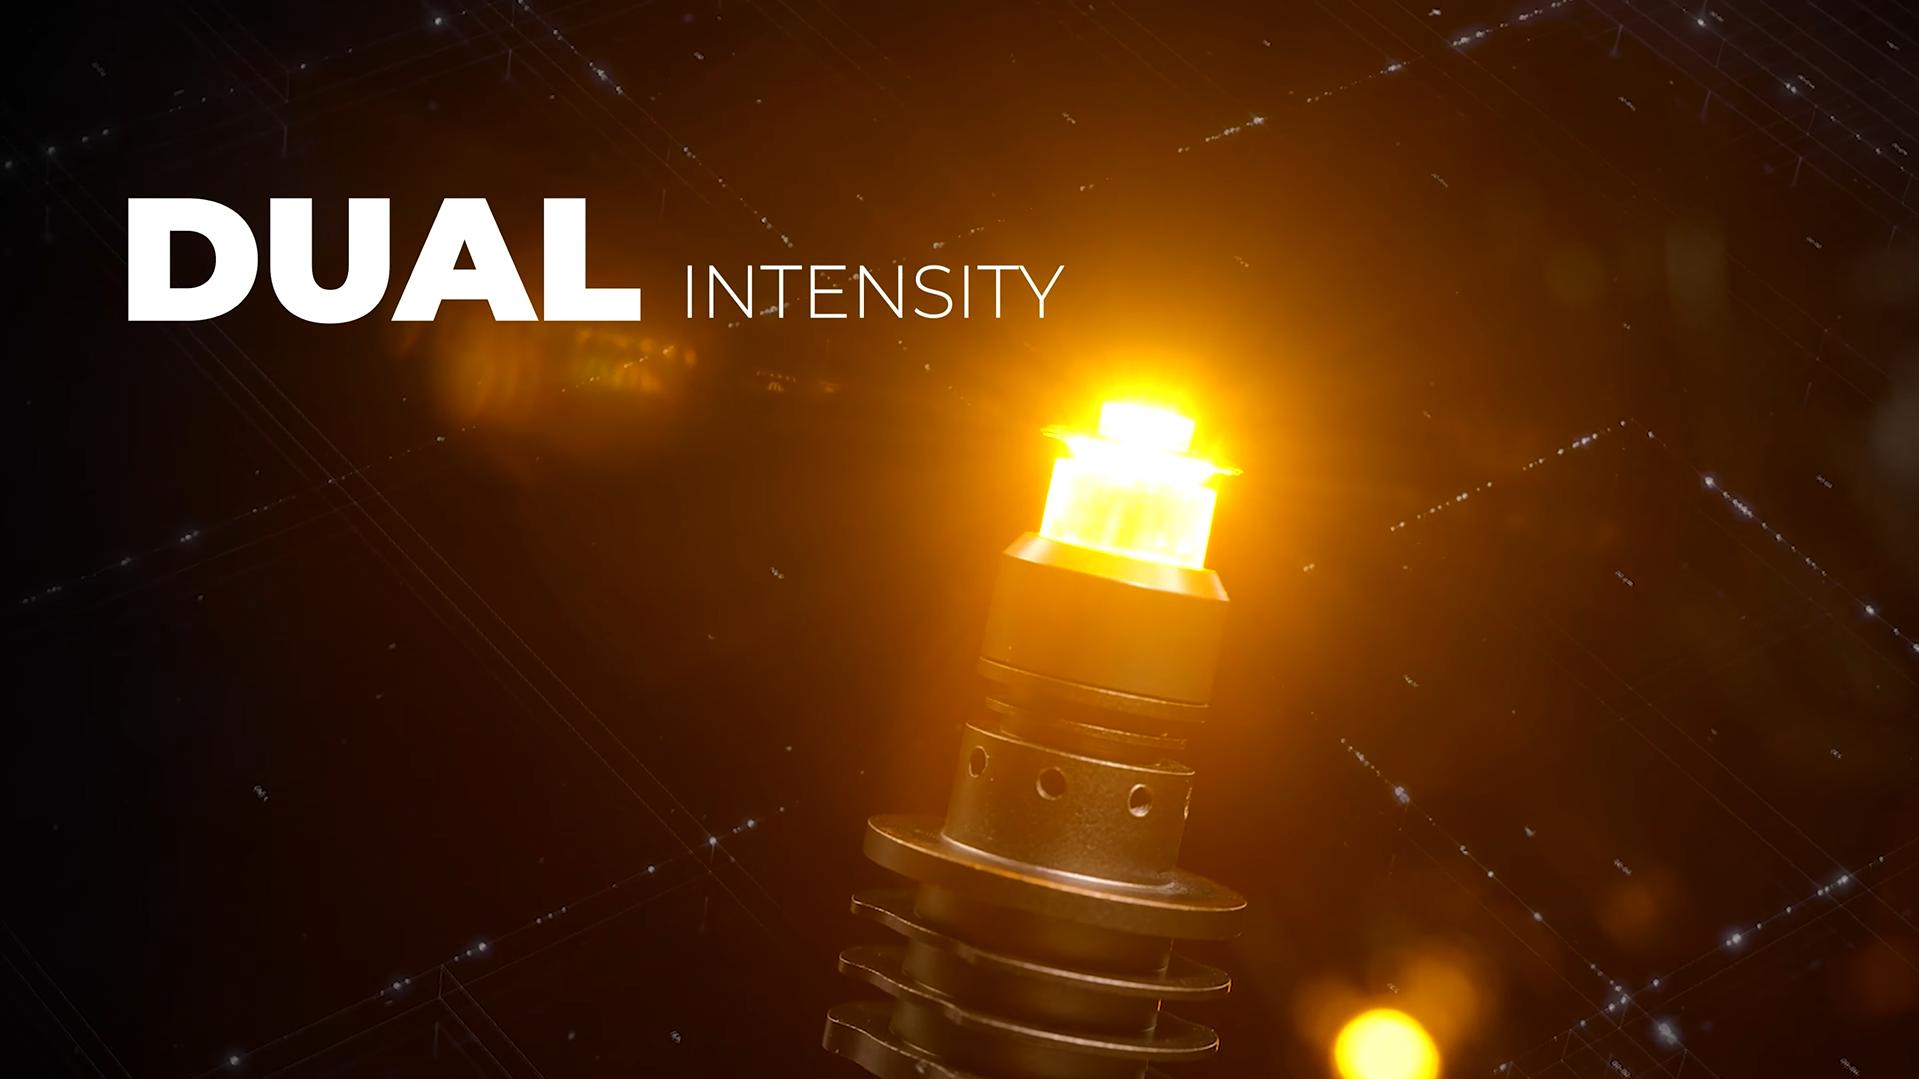 GTR lighting ILED Bulb Turn Signal Installation LED incandescent light bulb